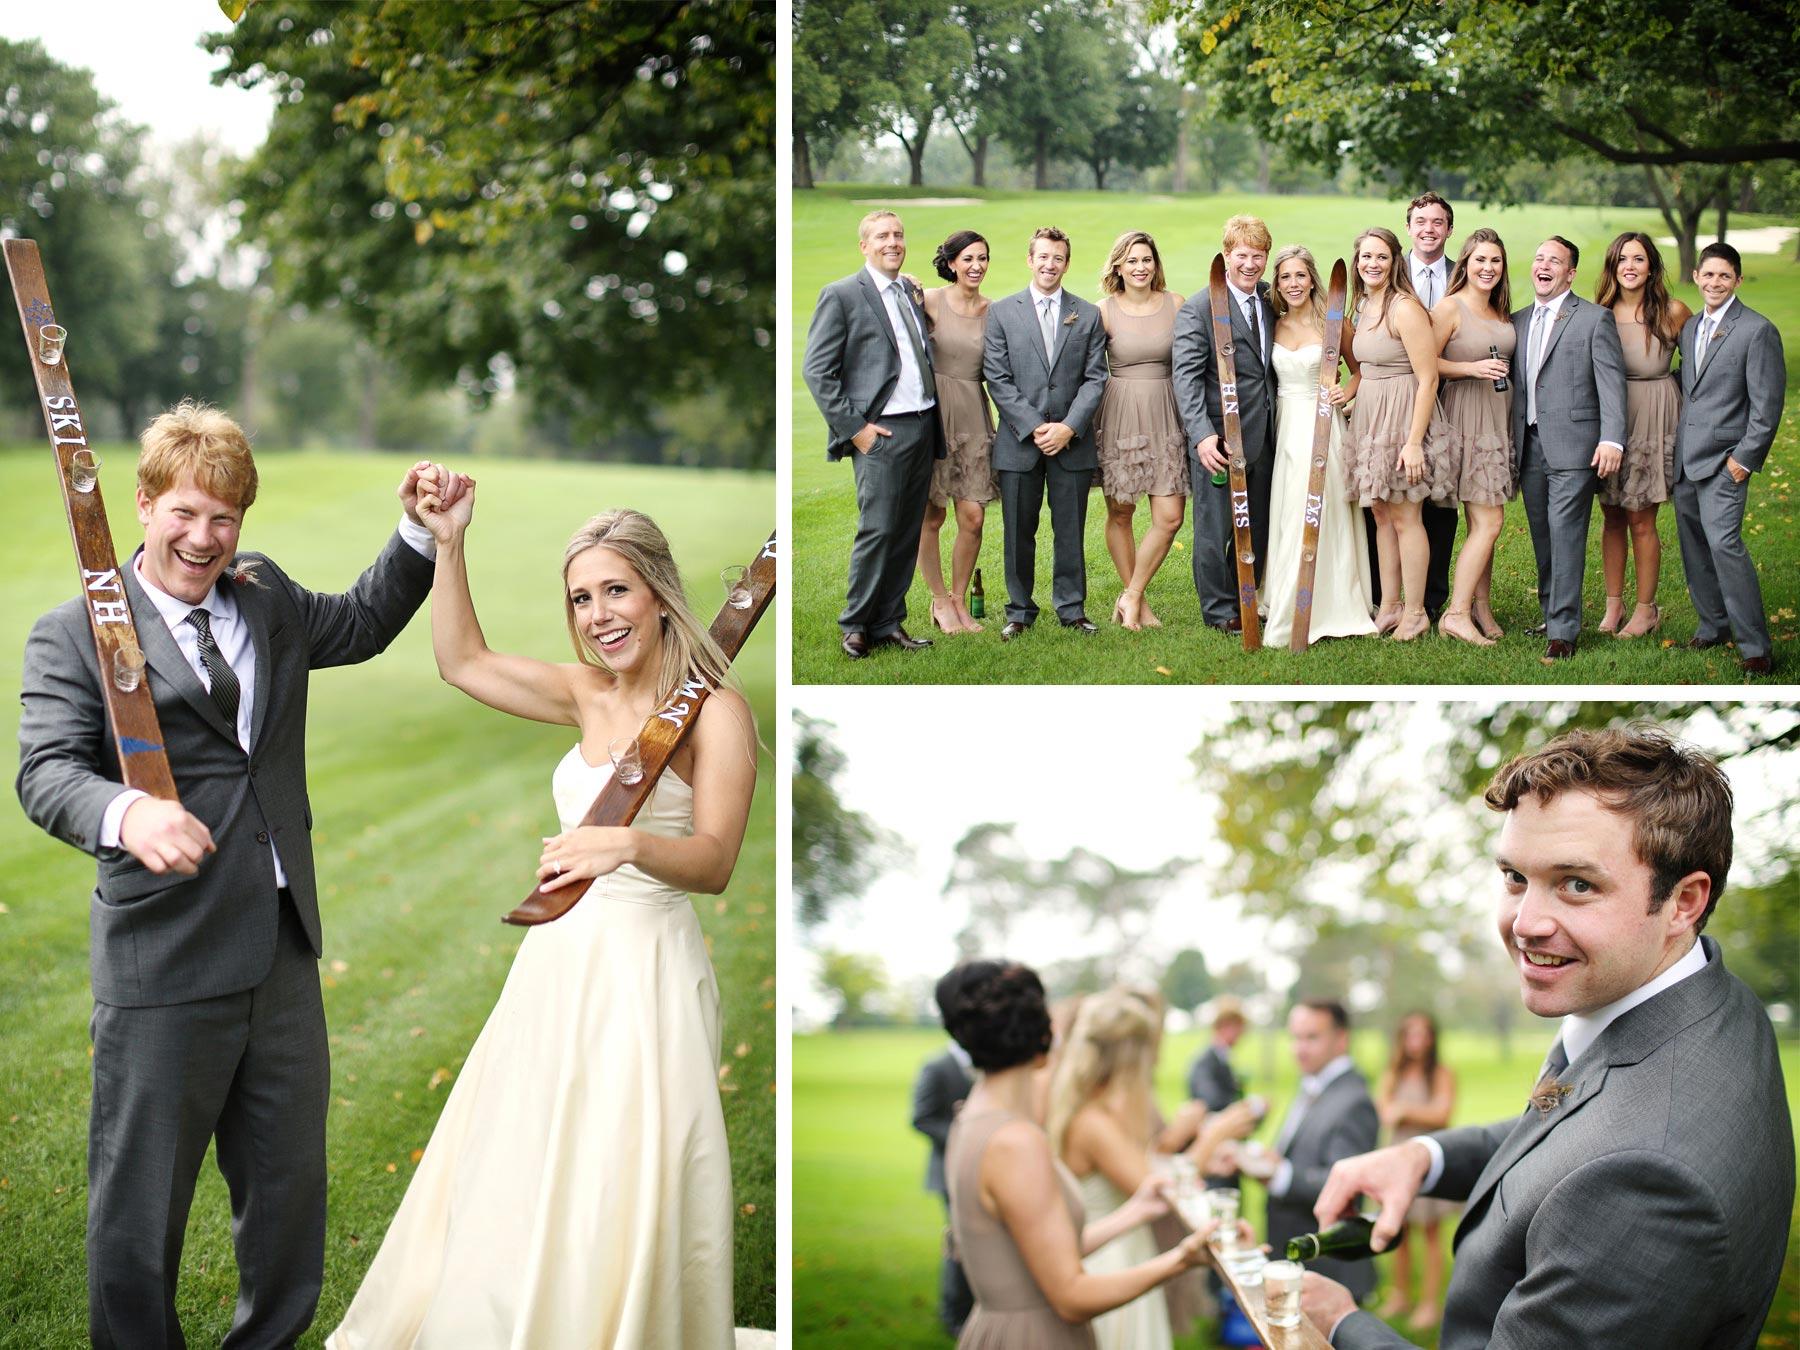 16-Minneapolis-Minnesota-Wedding-Photographer-by-Andrew-Vick-Photography-Fall-Autumn-Minikahda-Club-Bride-Groom-Bridal-Party-Bridesmaids-Groomsmen-Champagne-Shot-Ski-Golf-Course-Krissy-and-James.jpg